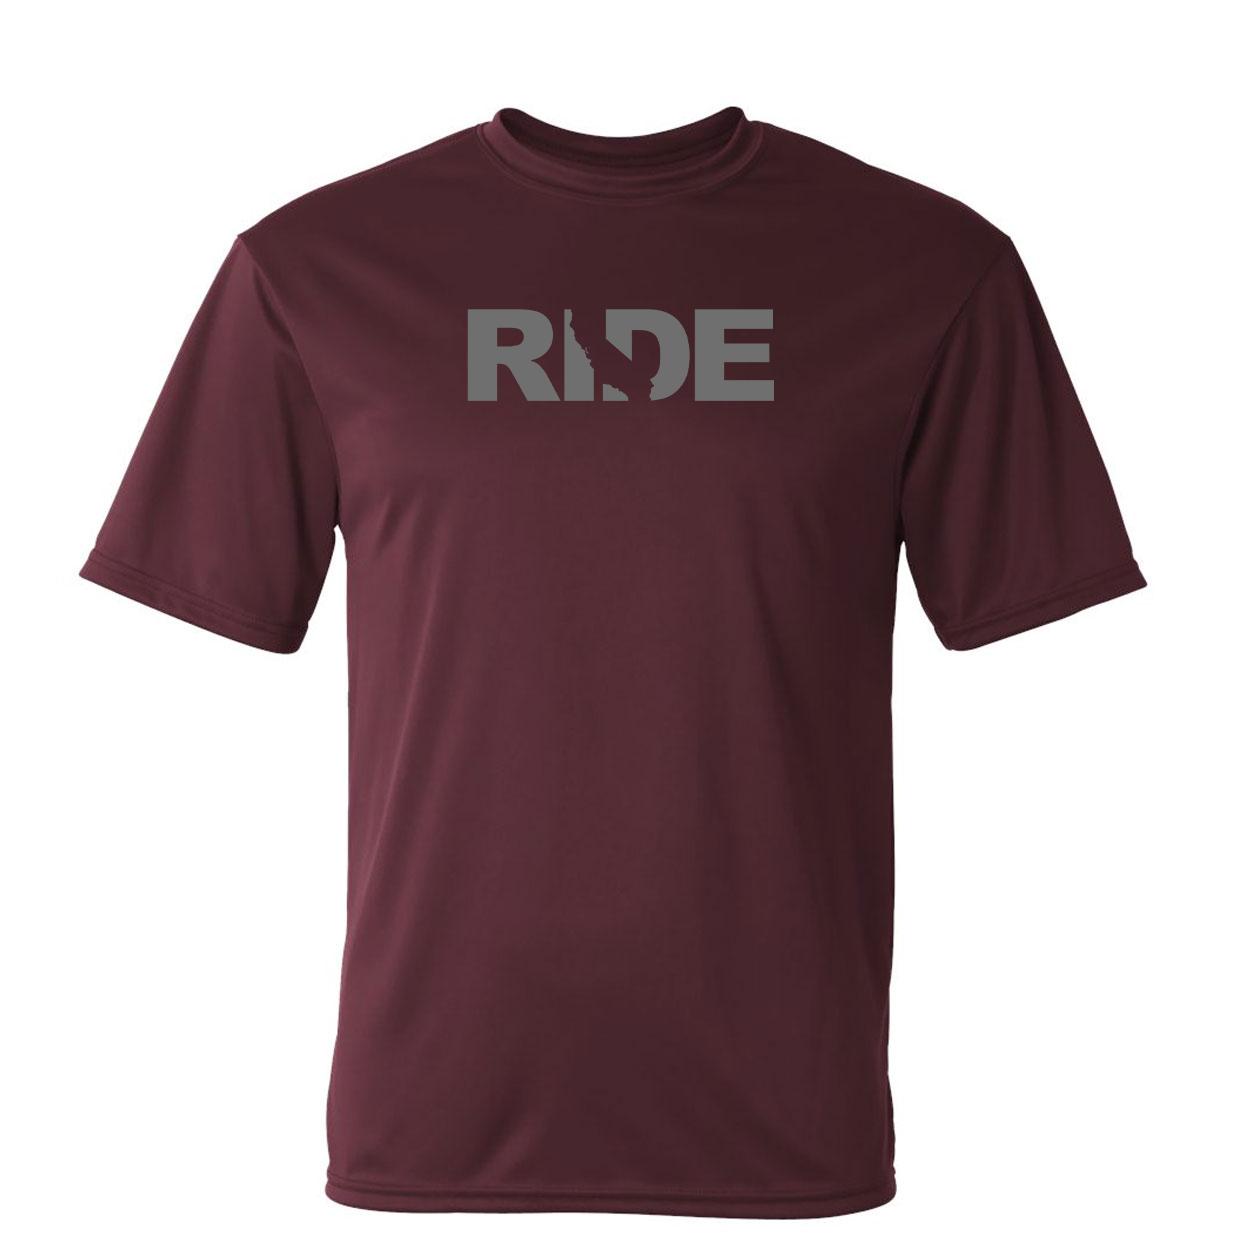 Ride California Classic Unisex Performance T-Shirt Maroon (Gray Logo)